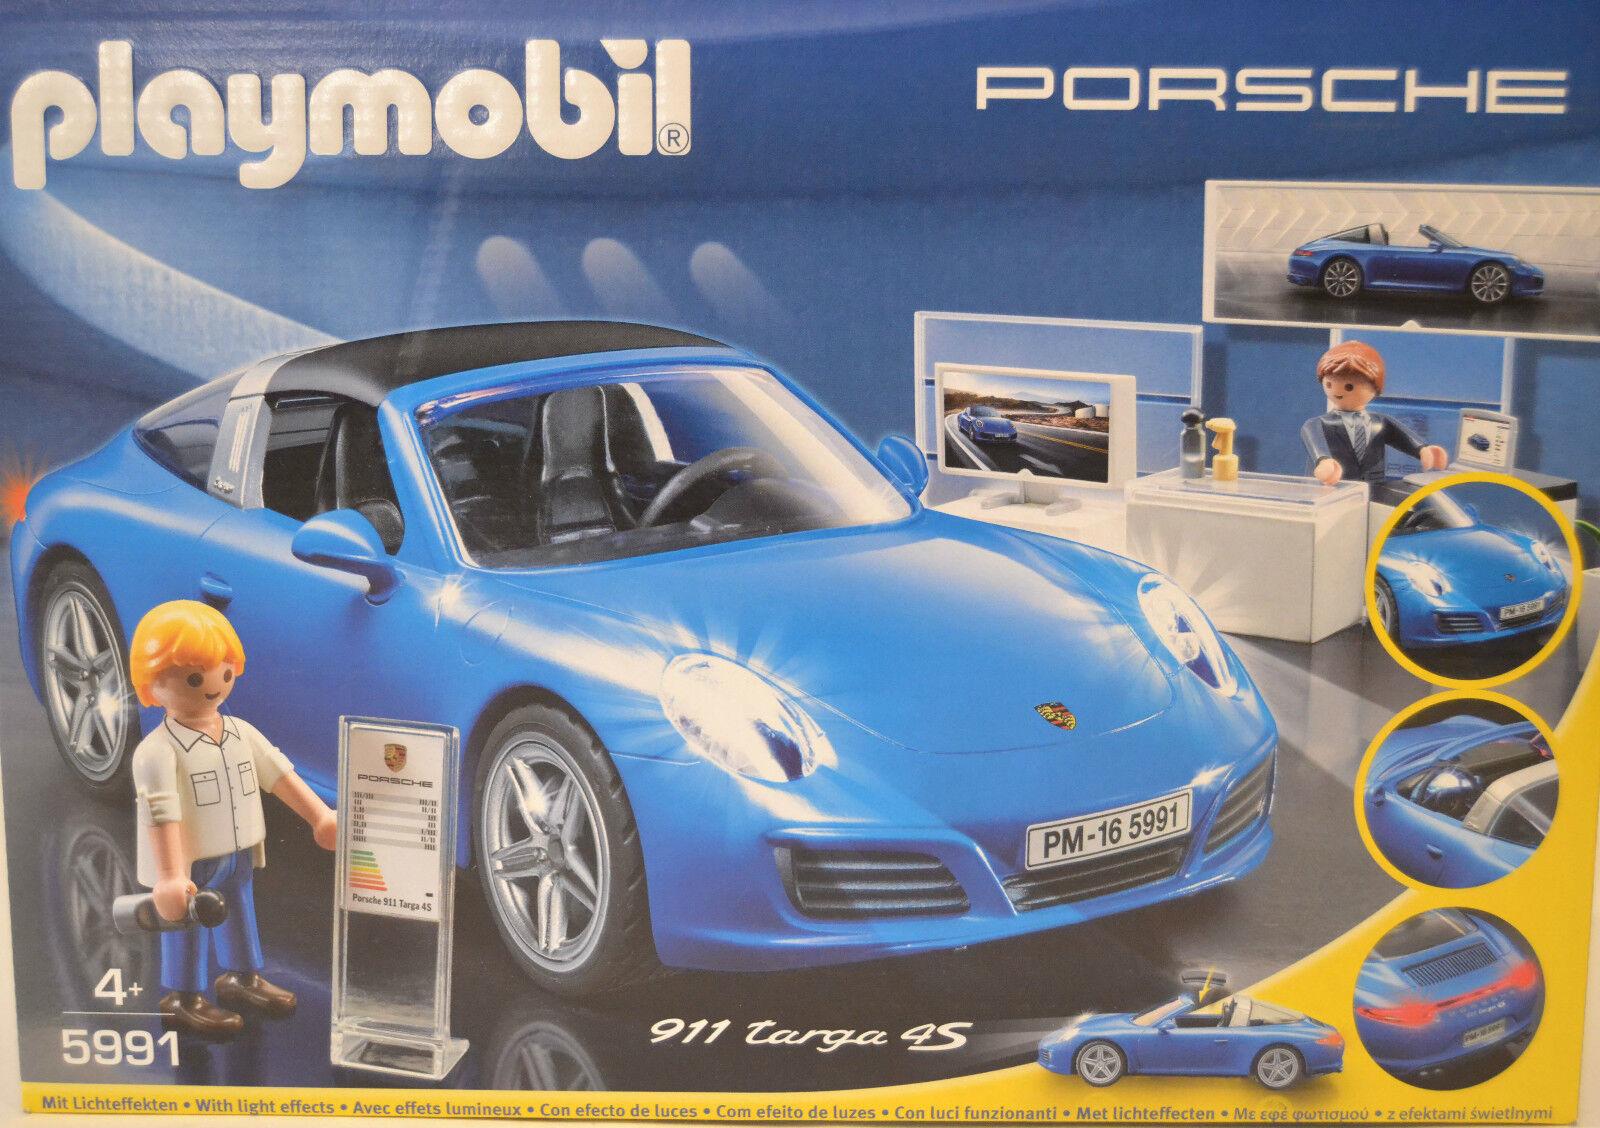 Playmobil 5991 Porsche 911 Targa 4S with Figures New & Orig. Box